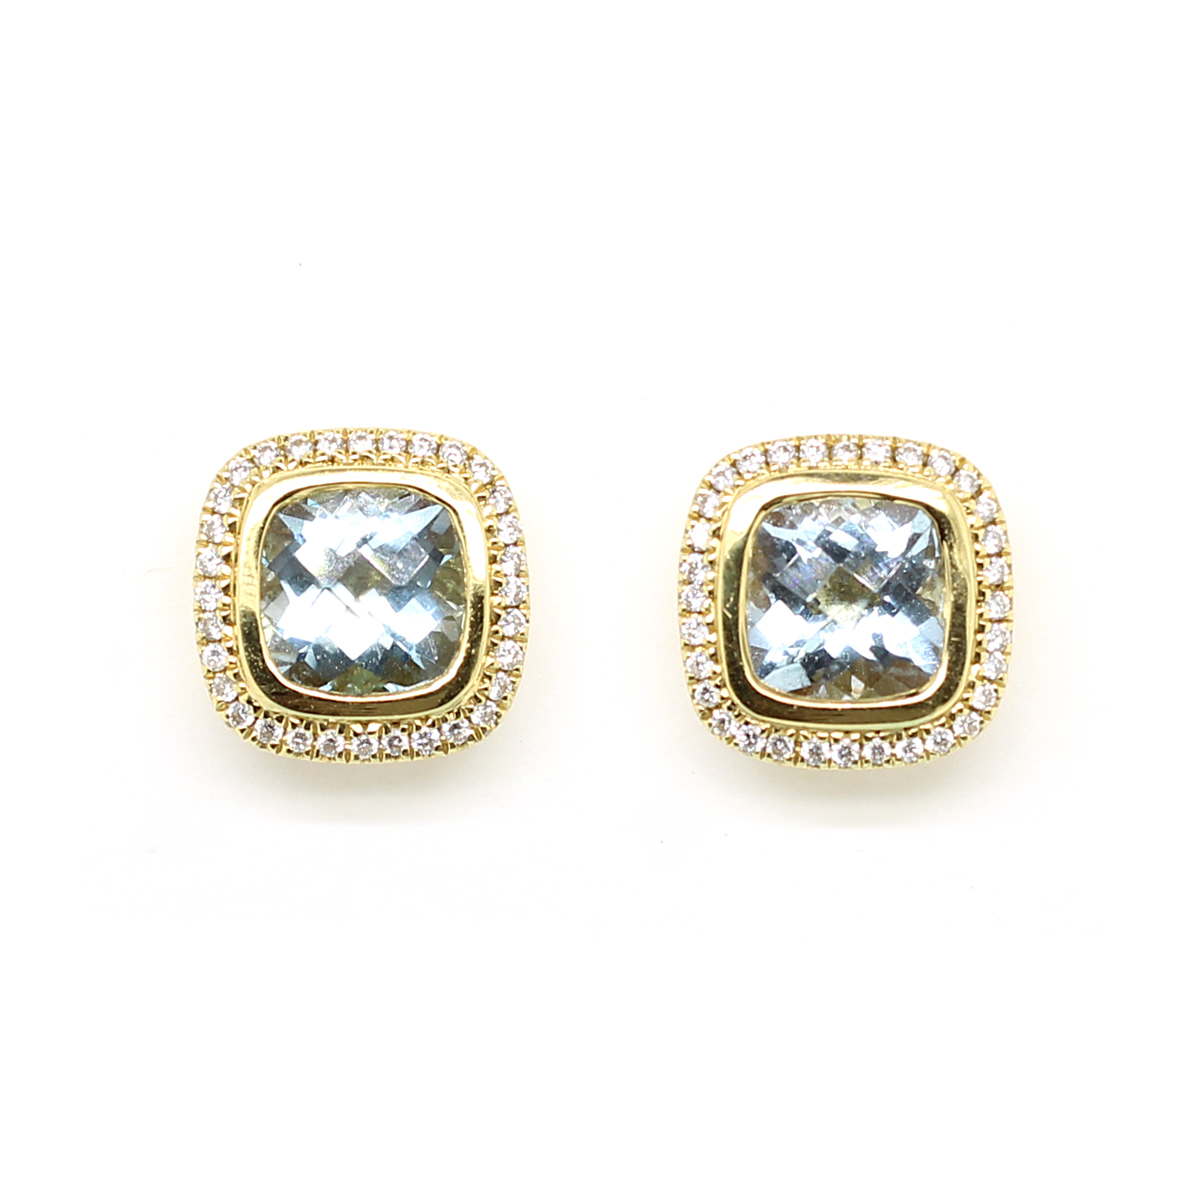 Charles Krypell 18 Karat Yellow Gold Aquamarine and Diamond Earrings